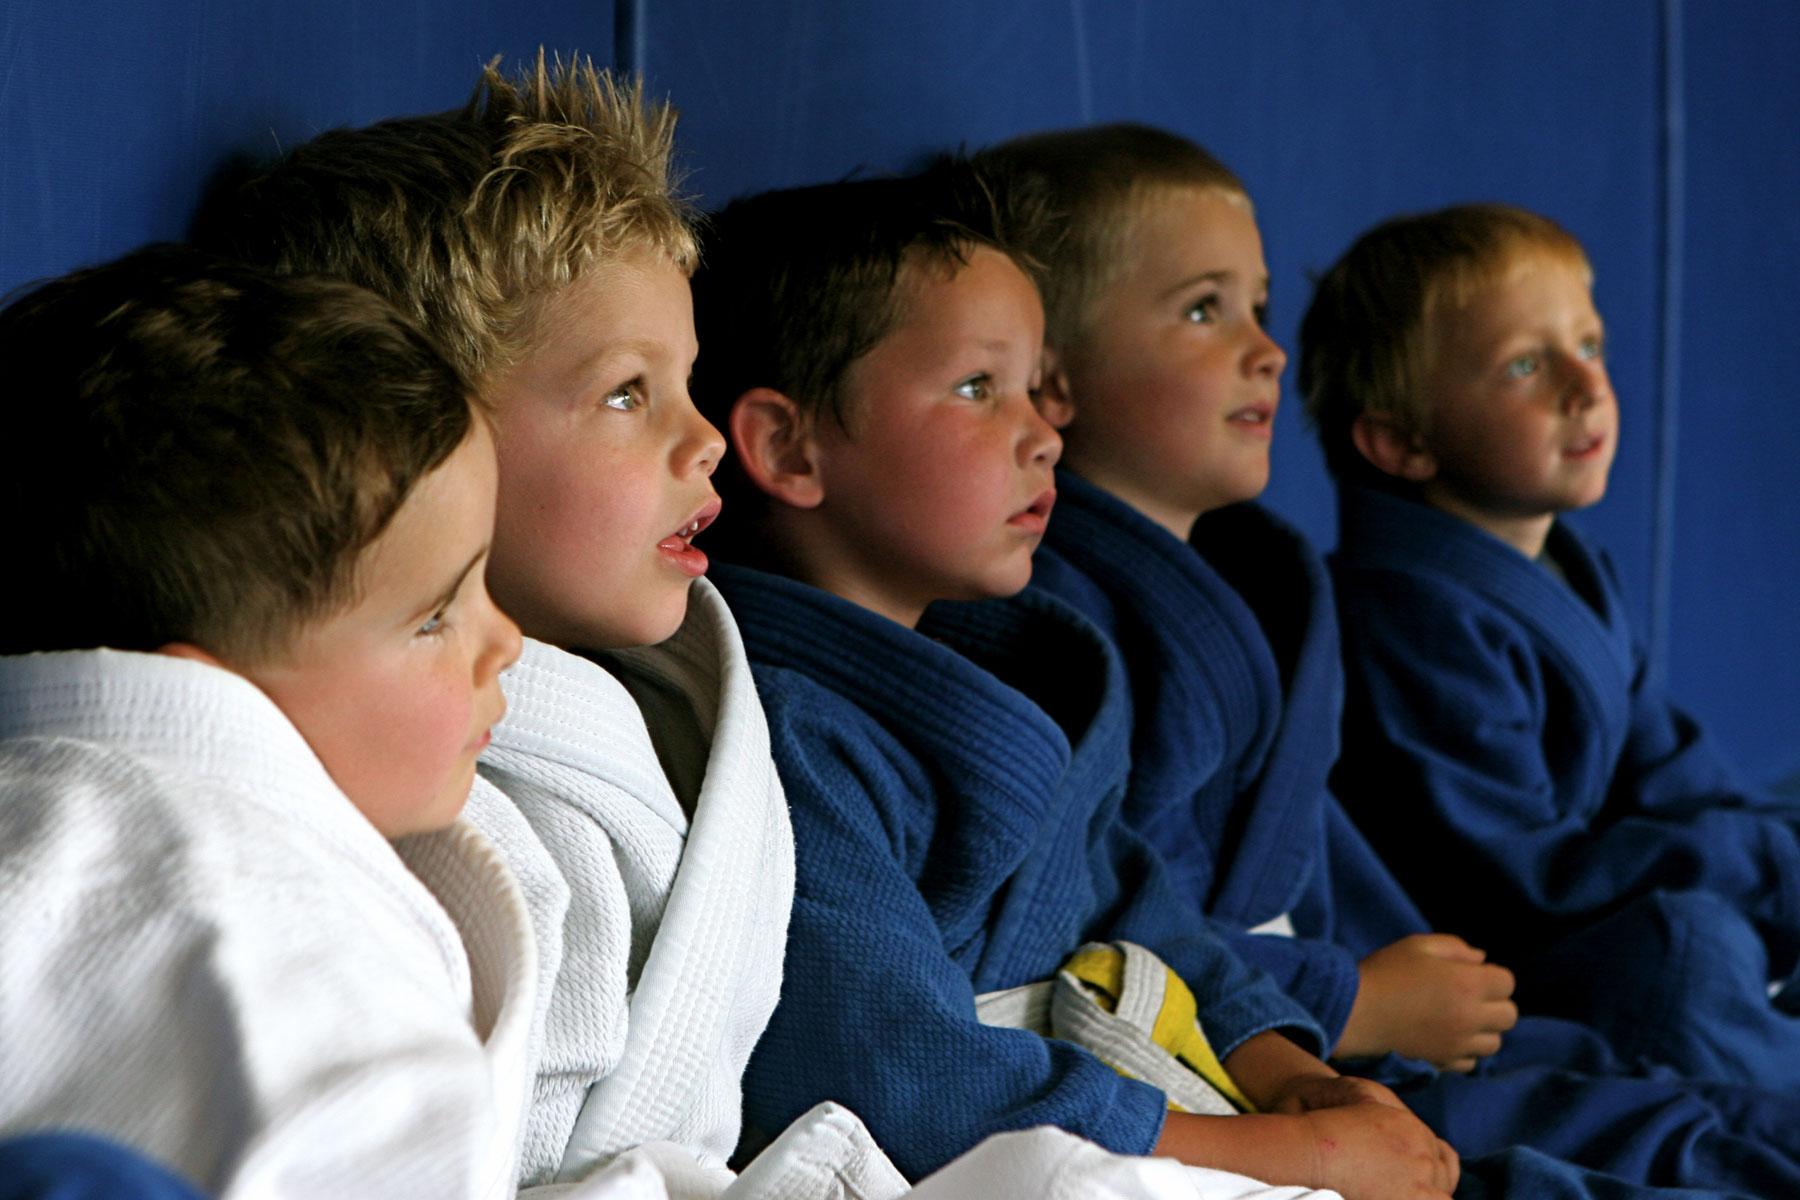 kids jiu jitsu classes at Devine Jiu Jitsu Saint Simons SSI   © 2017 Charlie Moore Training - www.charliemooretraining.com